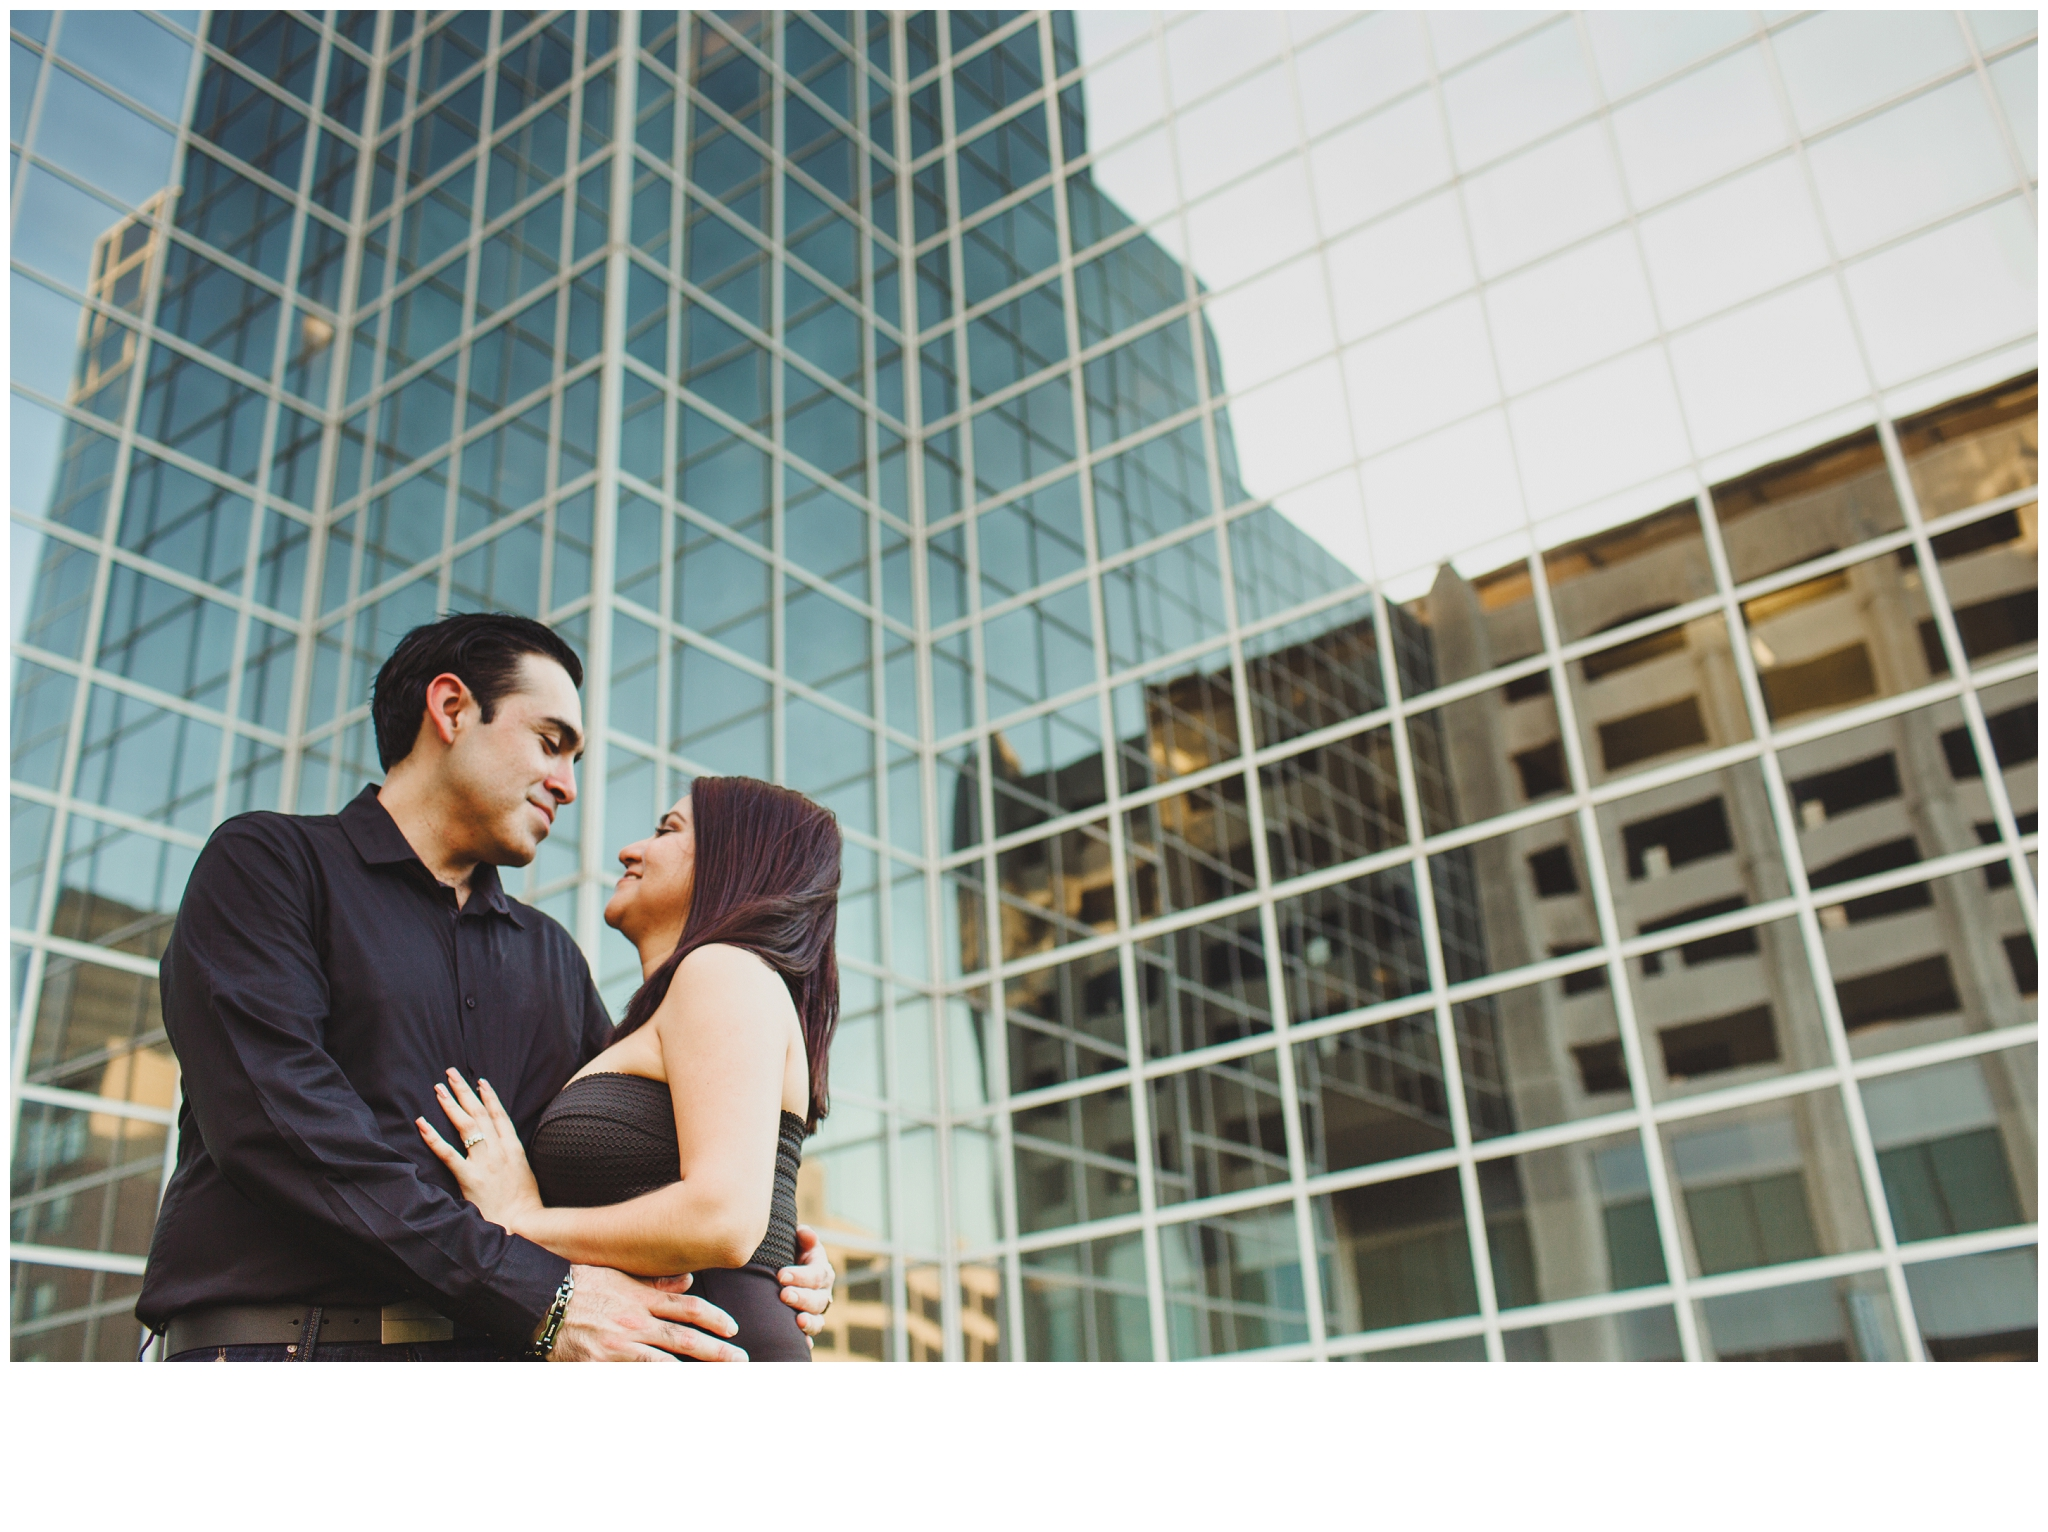 houston-engagement-photographer-waterwall-proposal-downtown_0012.jpg